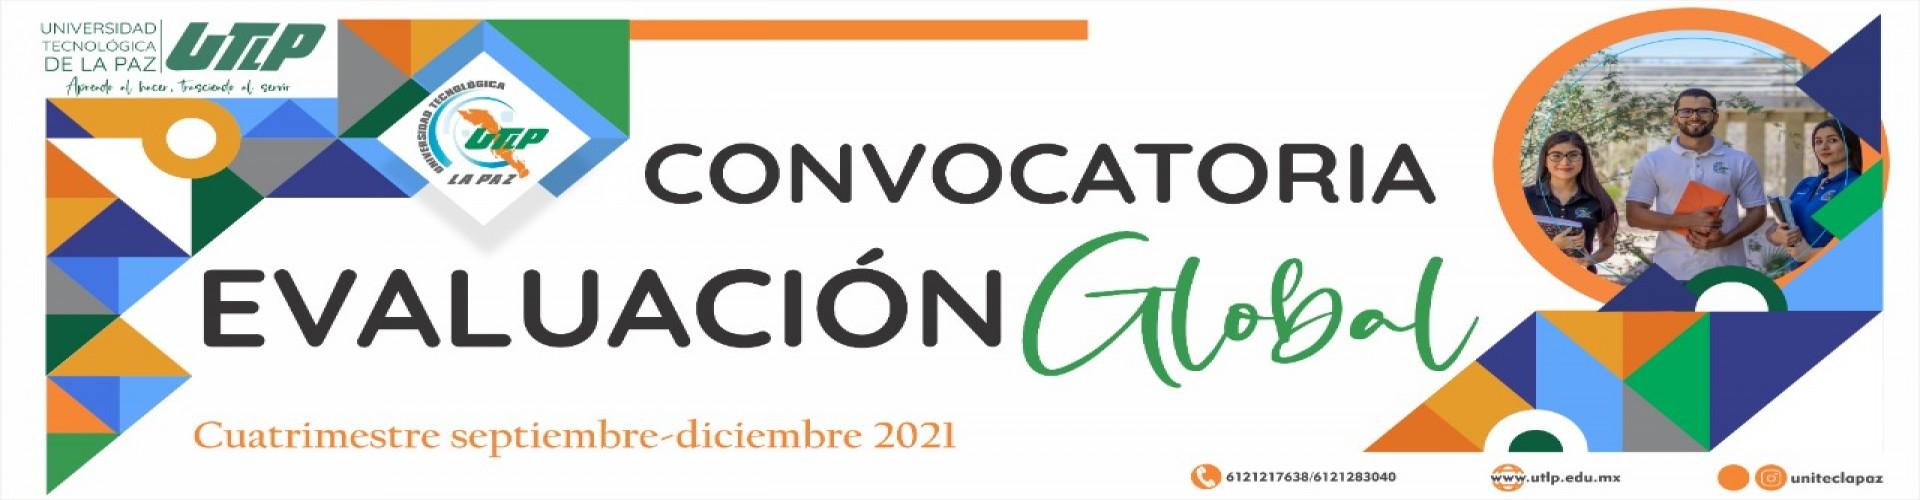 Convocatoria Evaluación Global Sep - Dic 2021